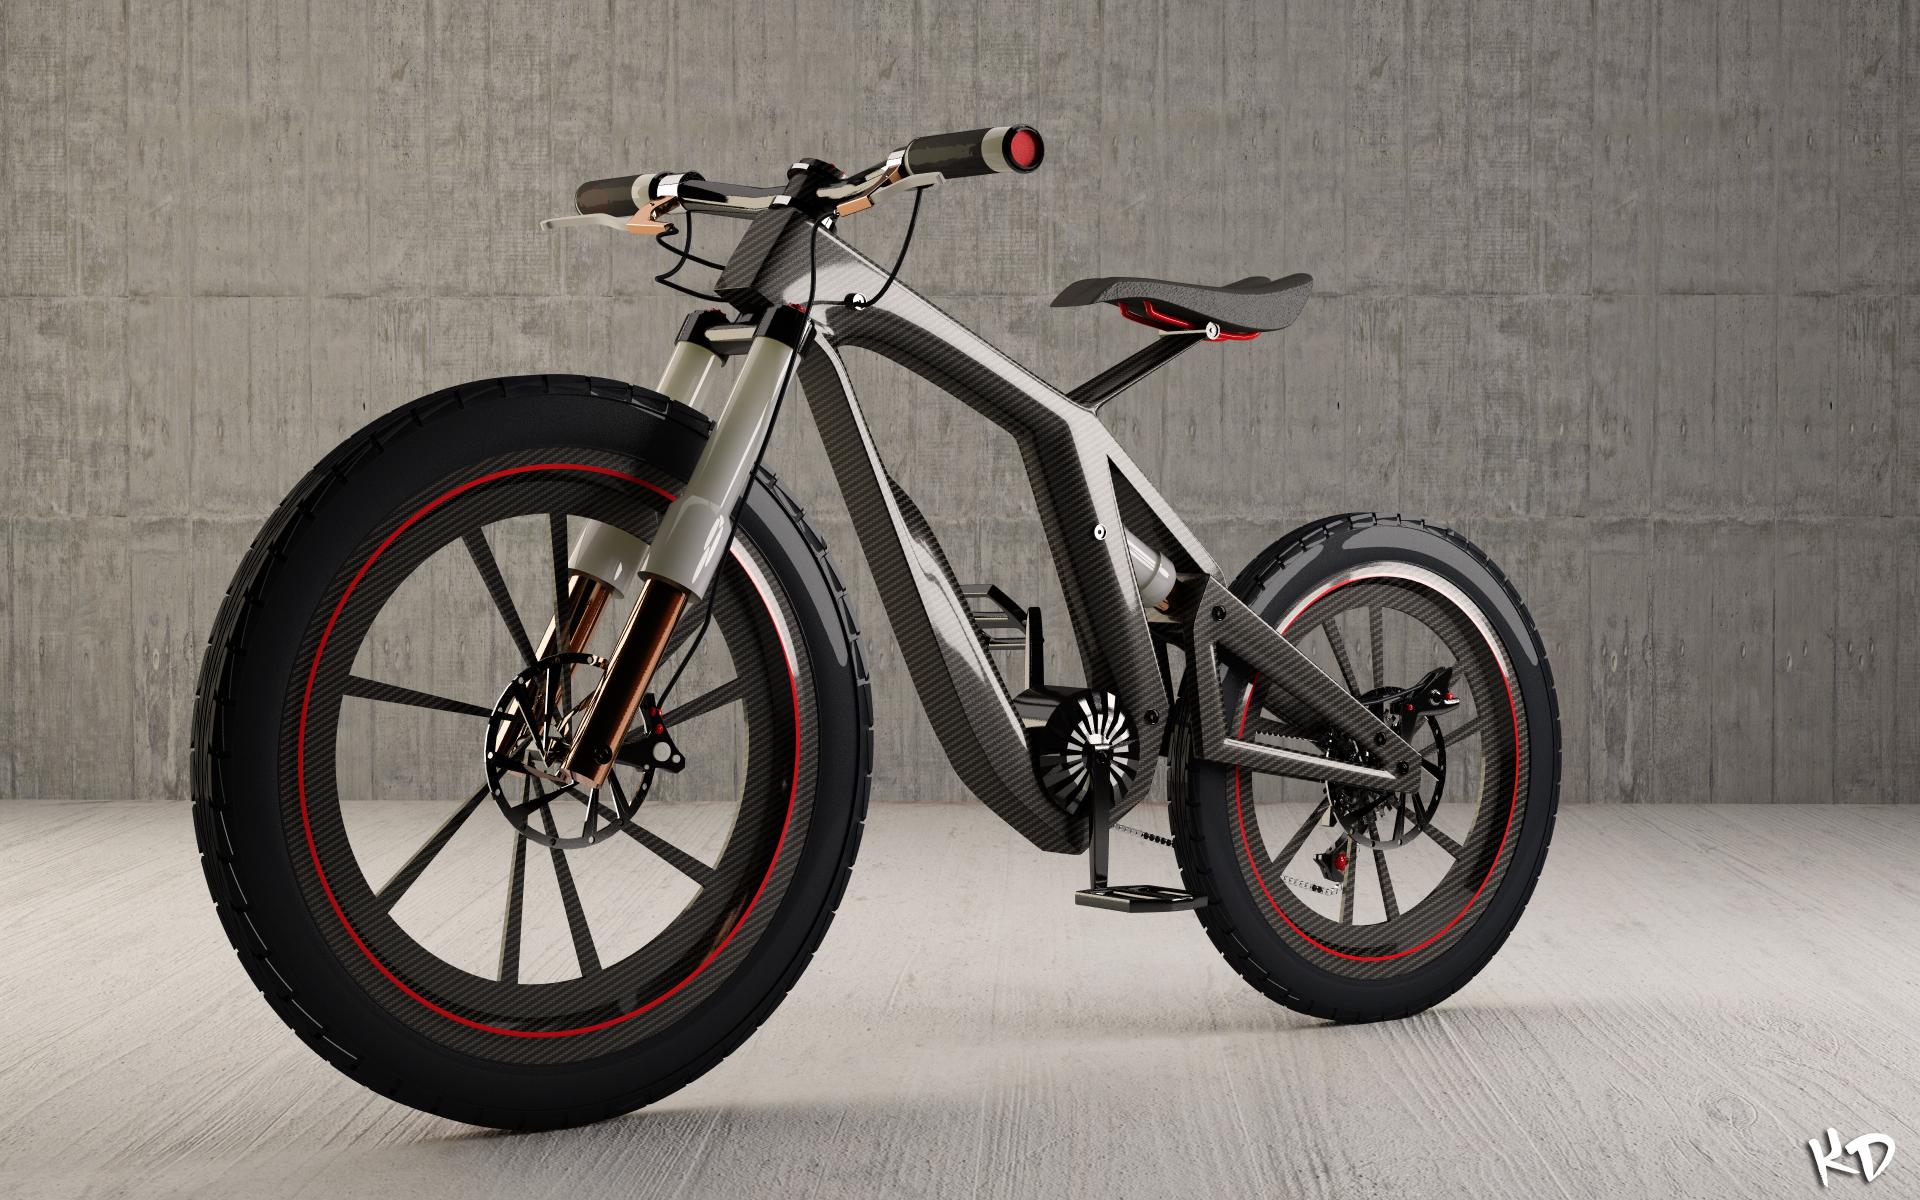 Concept Bike Final Render By Krypt06 On Deviantart